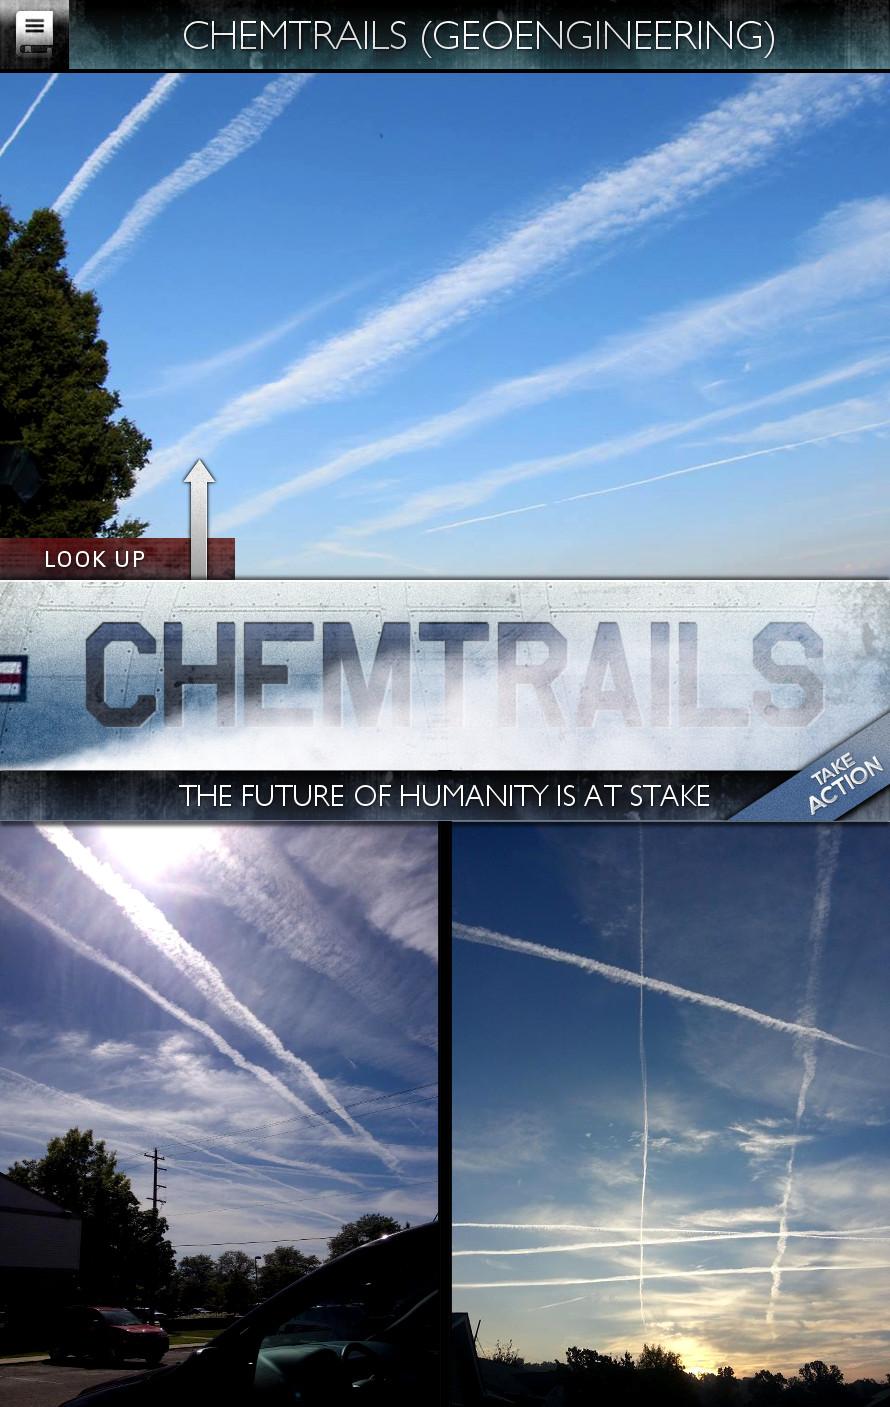 Chemtrails (Geoengineering)